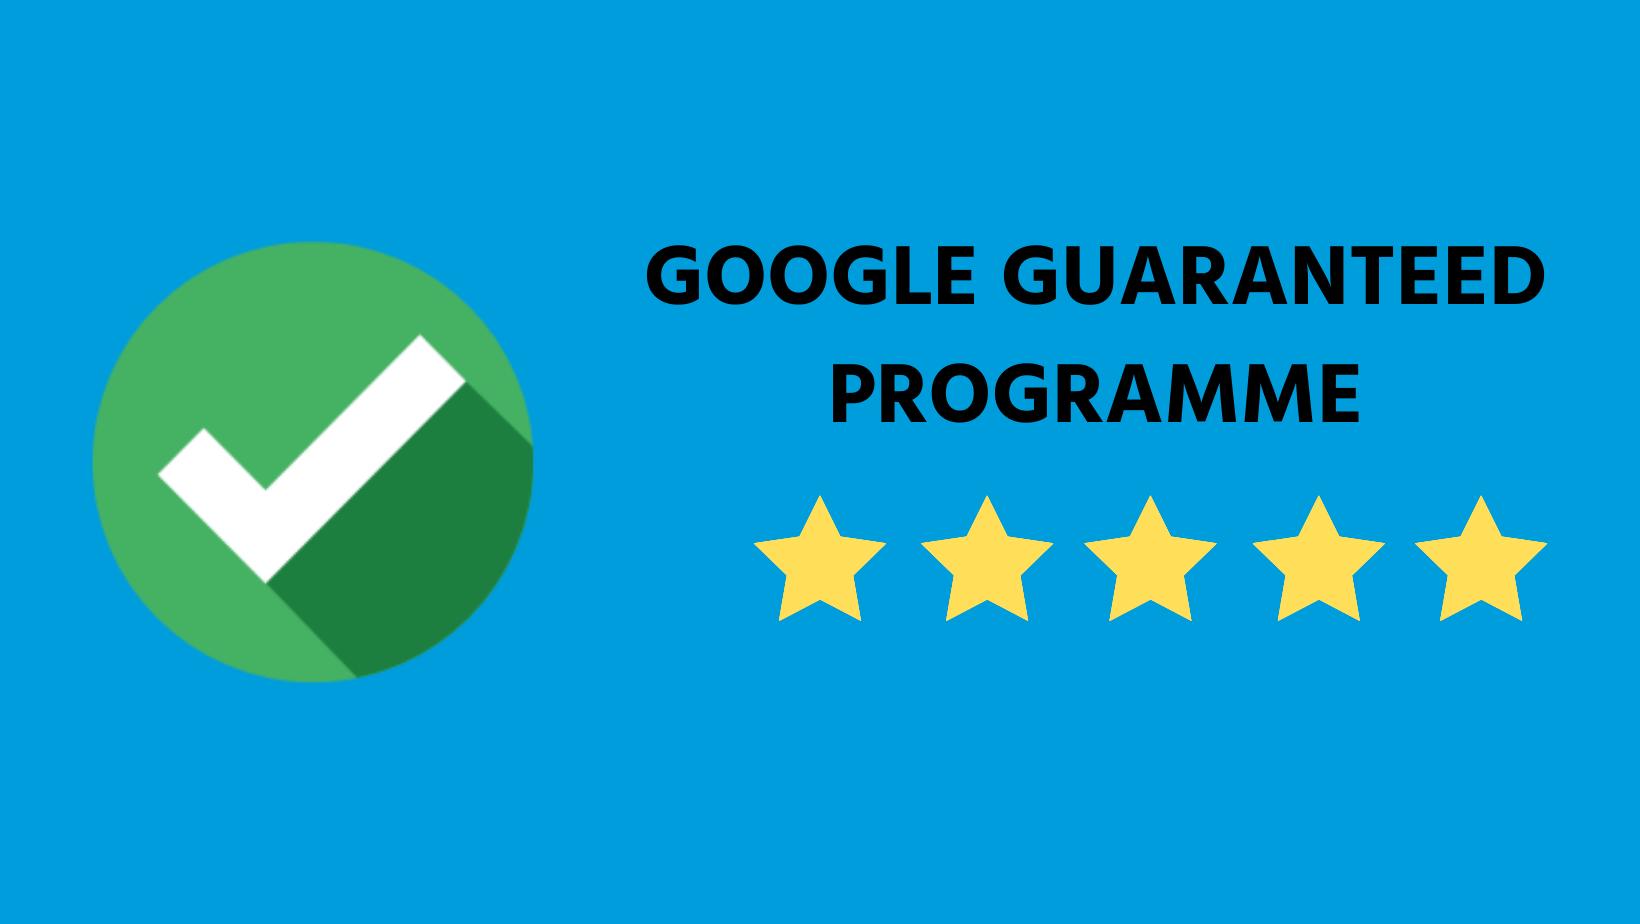 Google Guaranteed Programme Freelance SEO Essex